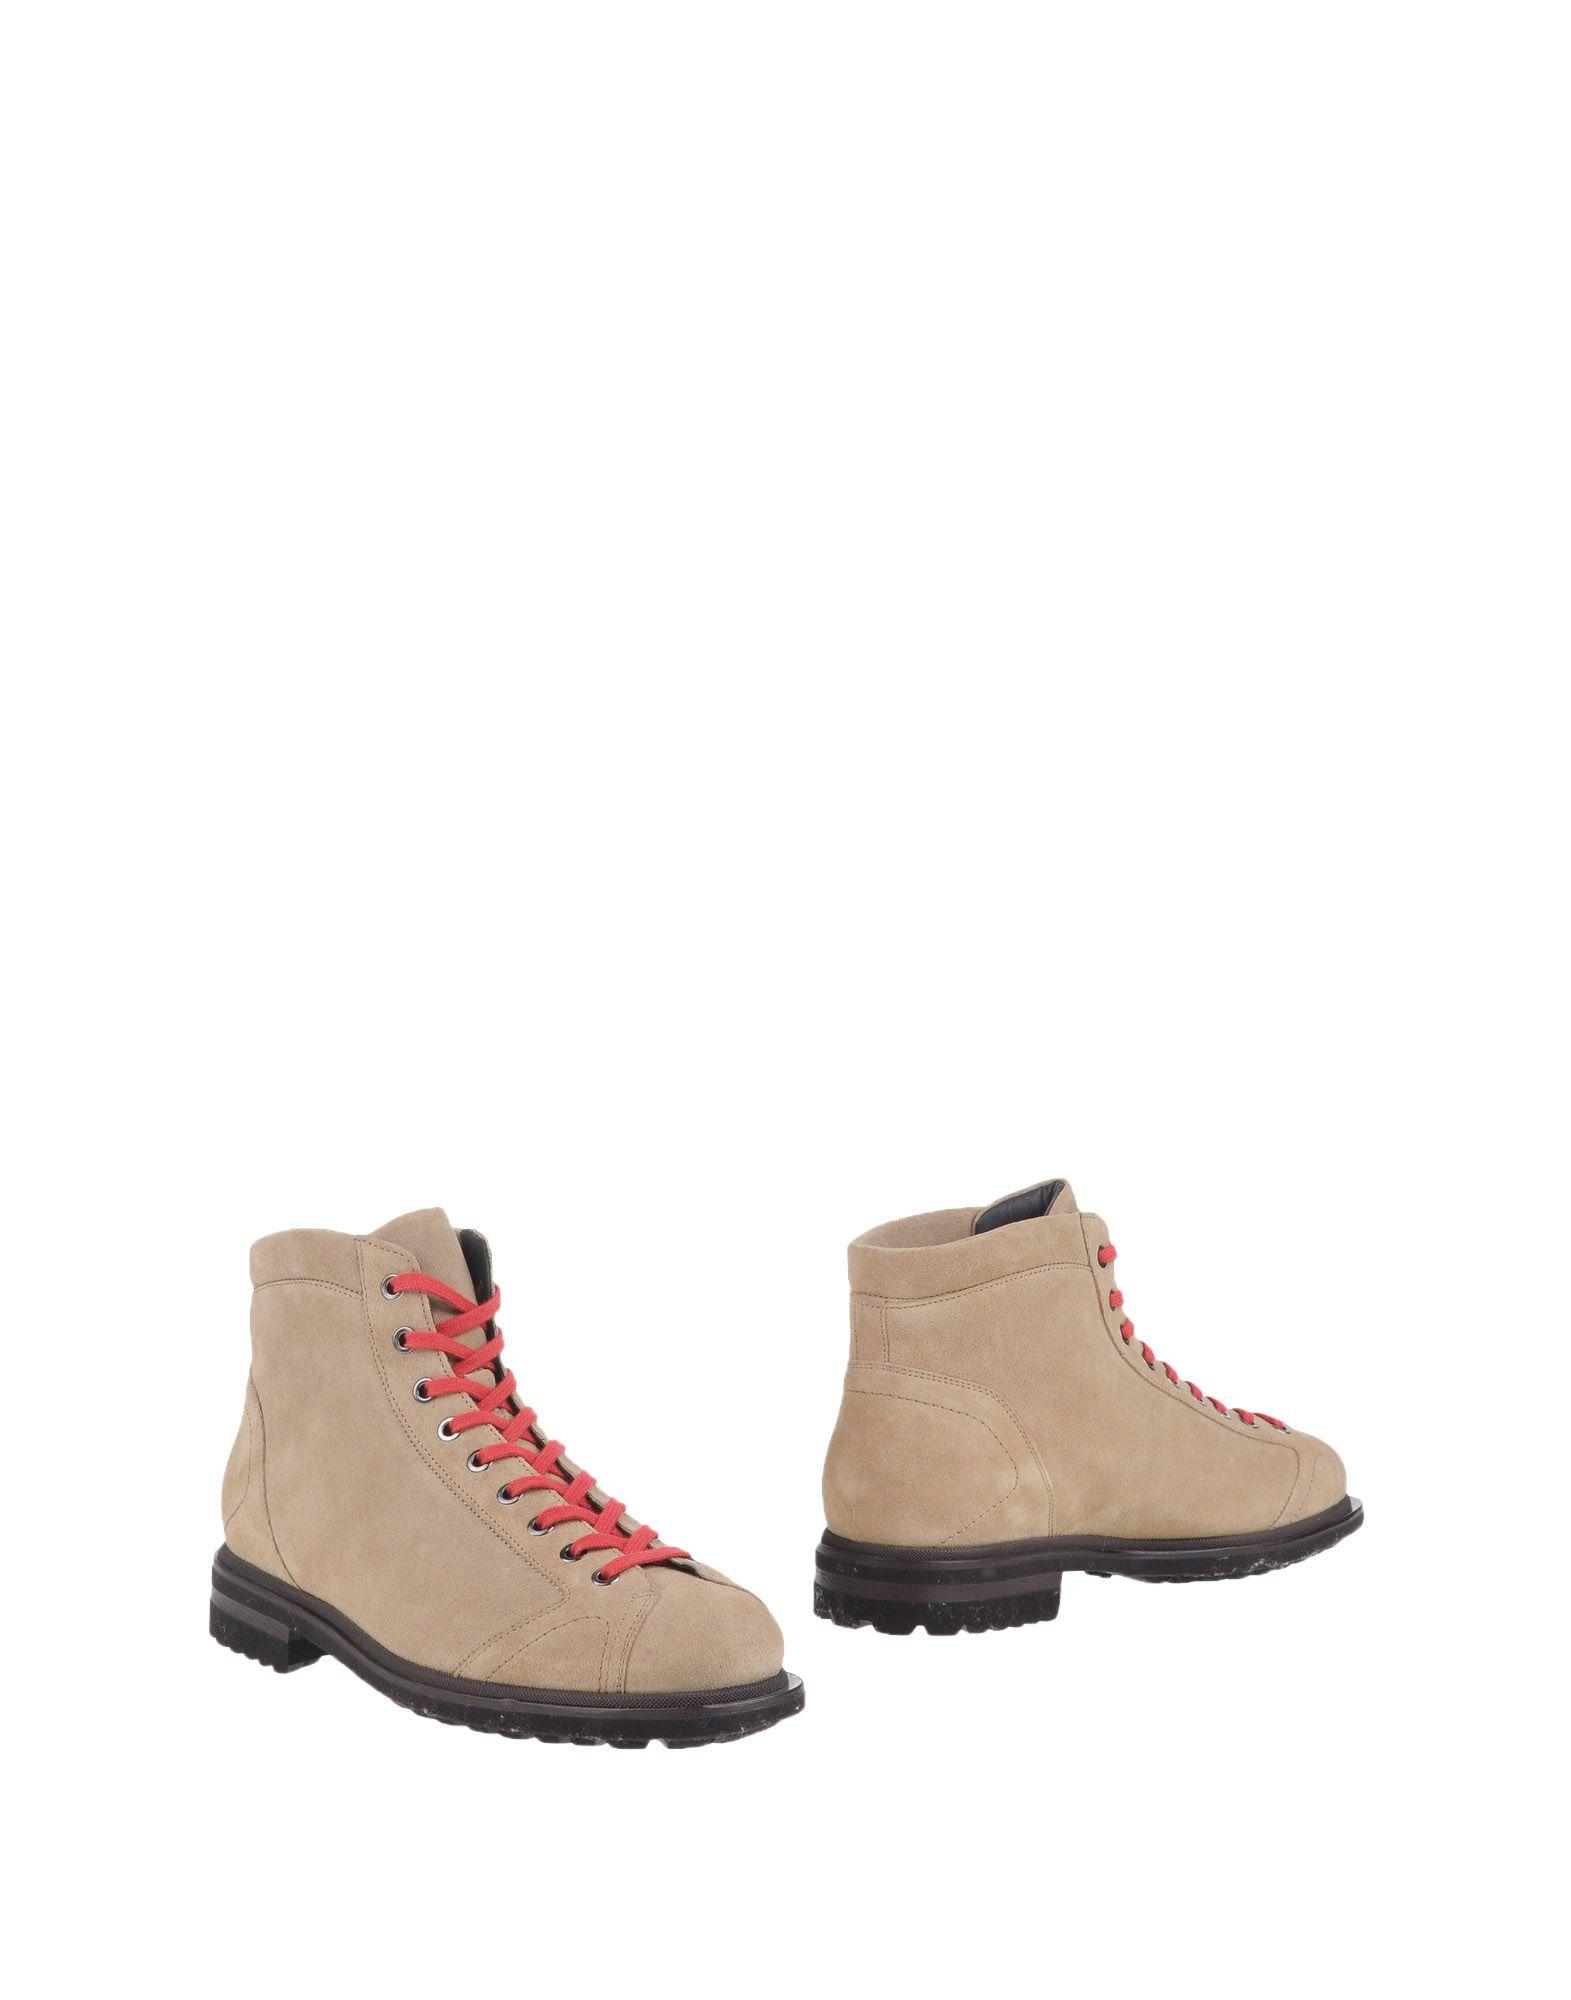 Santoni Stiefelette Herren  11056088OO Gute Qualität beliebte Schuhe